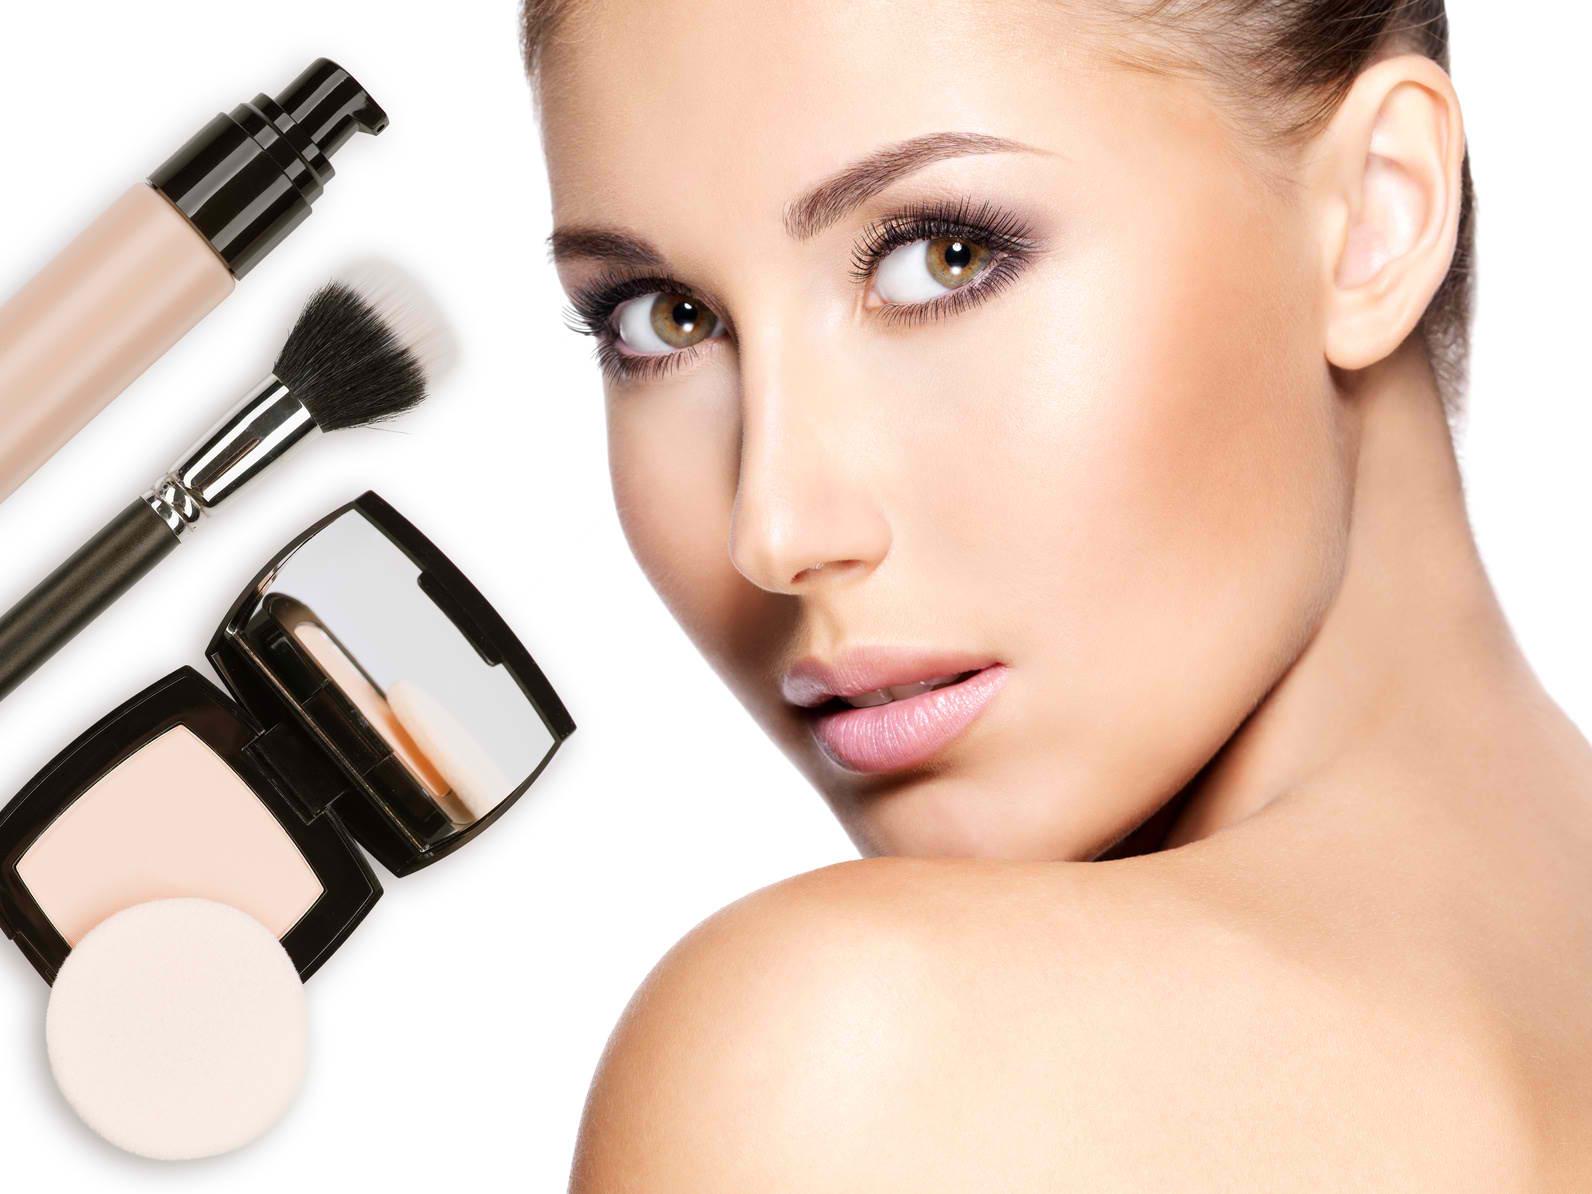 Foundation Makeup: Should You Use a Liquid or a Powder?